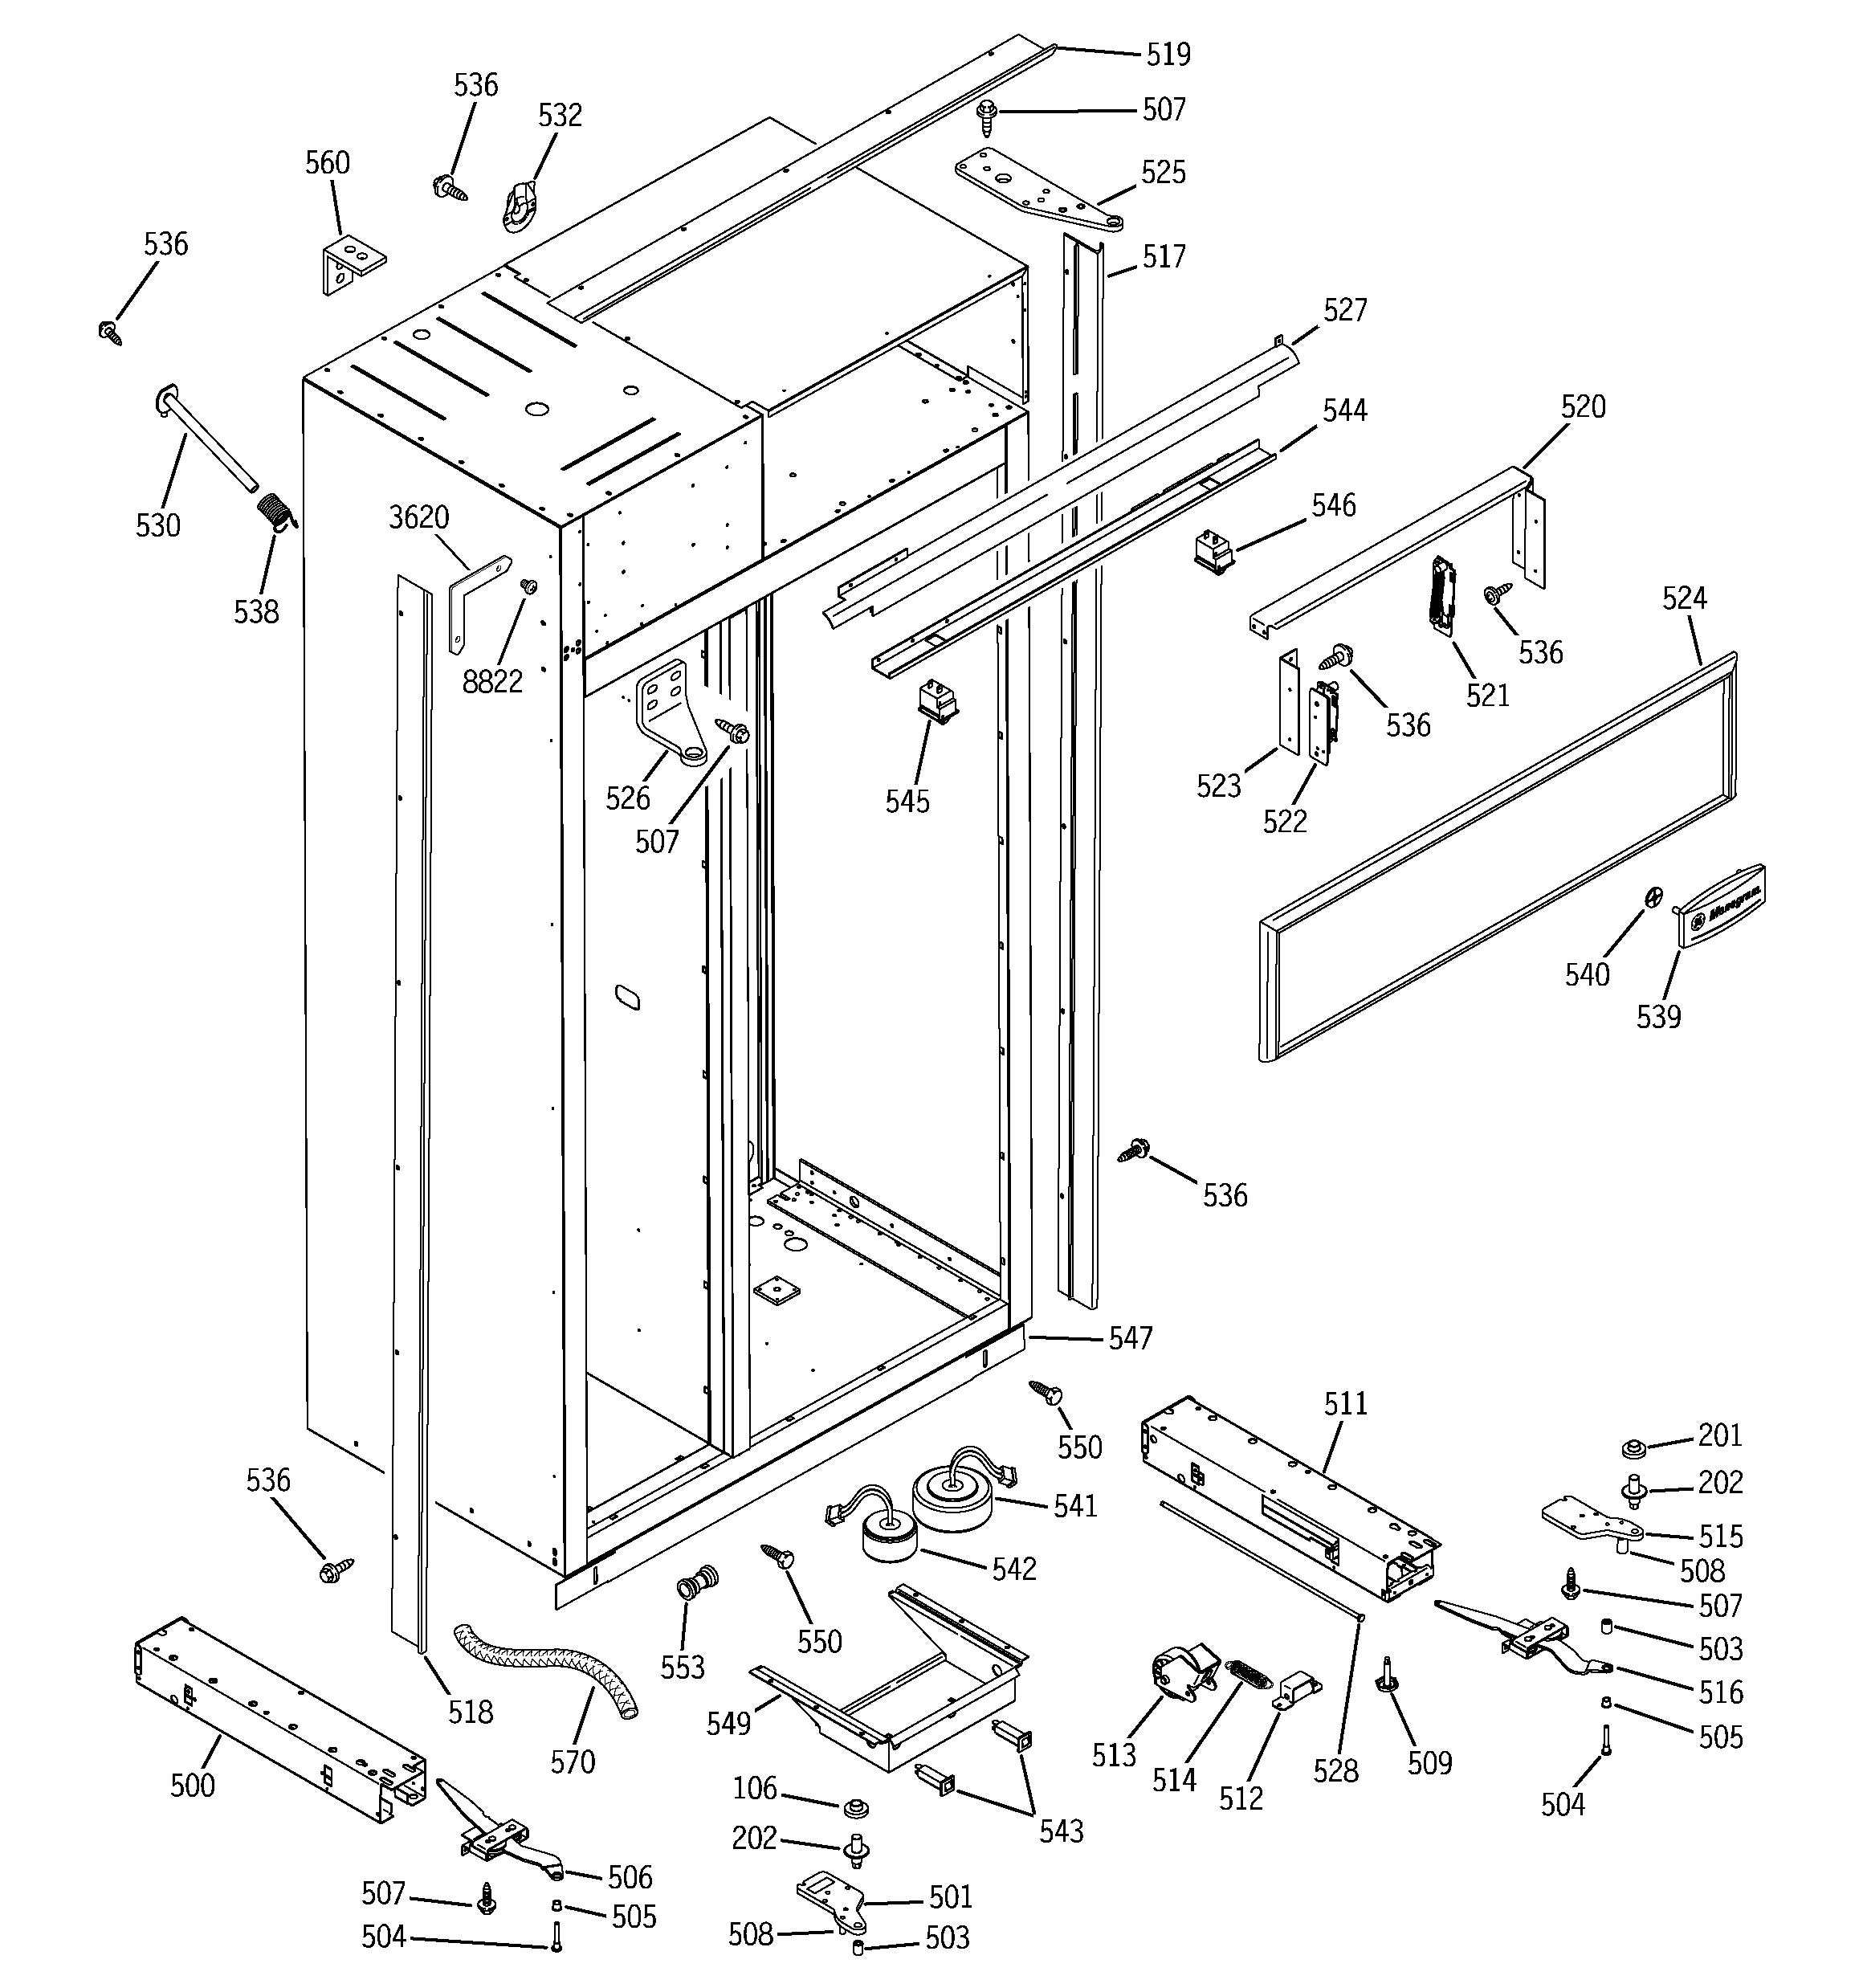 general electric wiring diagram ge refrigerators wiring diagram e3 wiring diagram  ge refrigerators wiring diagram e3